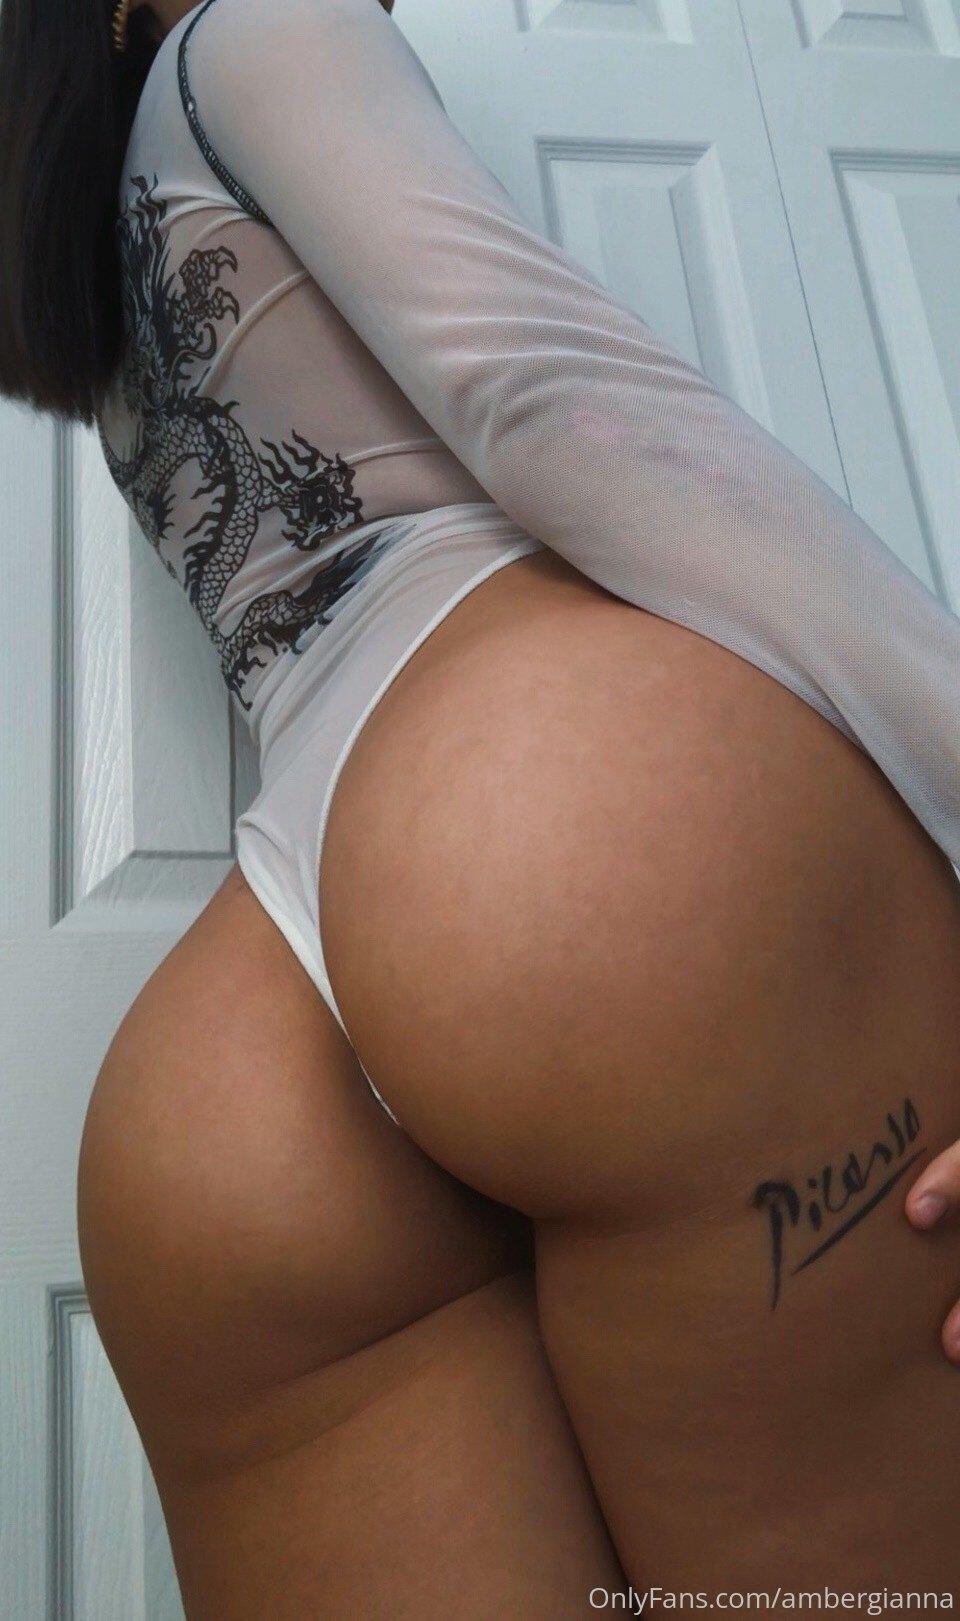 Amber Gianna Onlyfans 0096